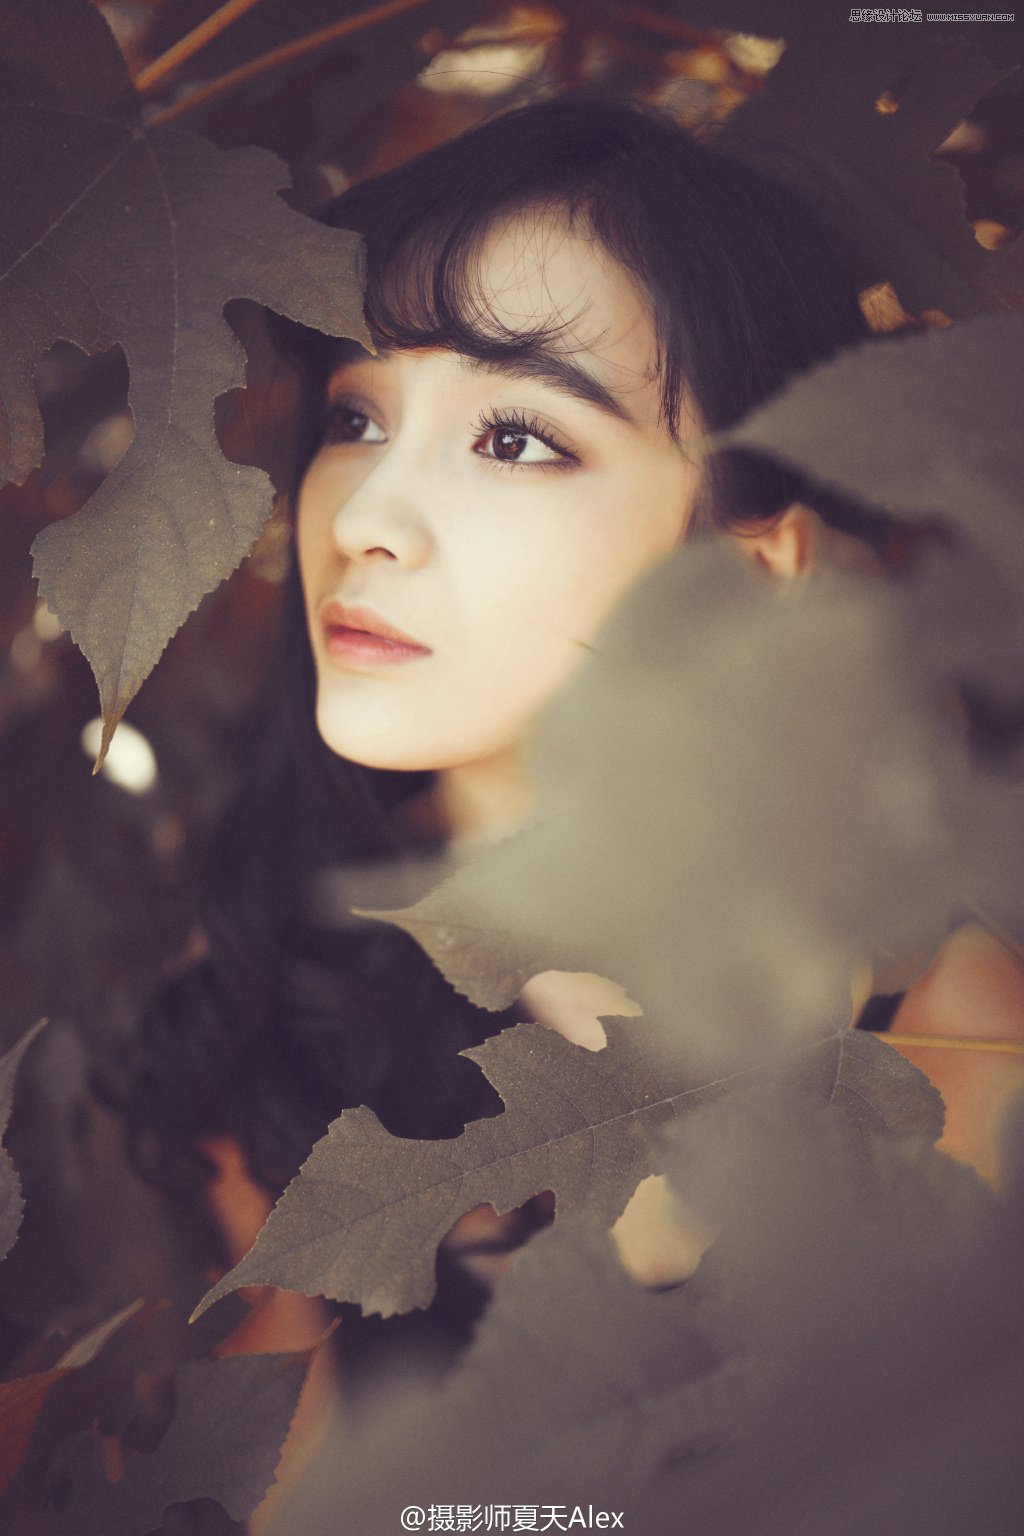 Photoshop调出树下美女人像秋季电影胶皮效果